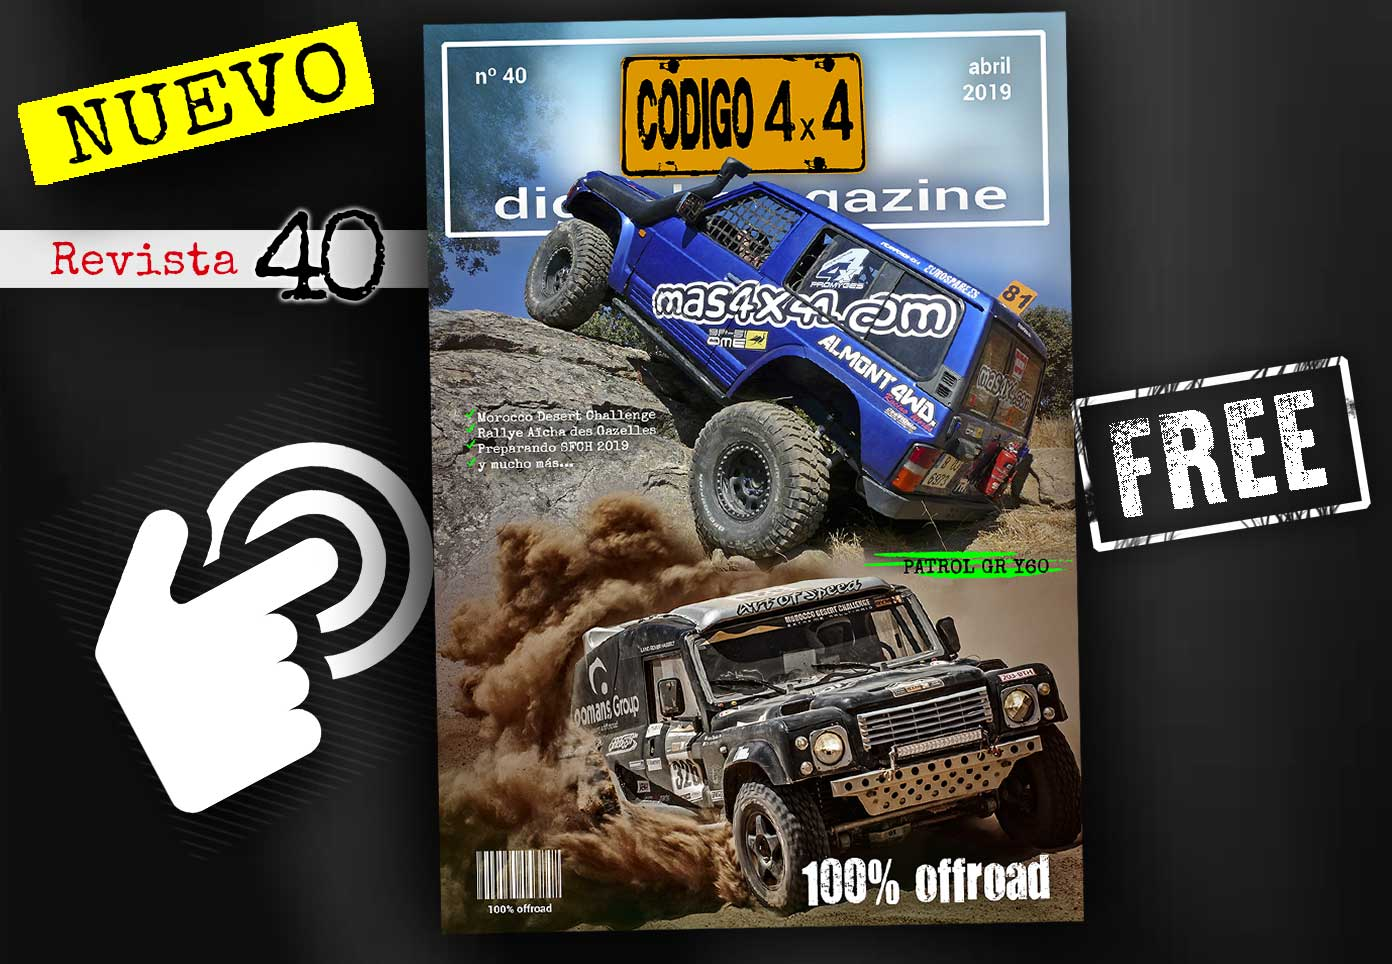 REV-40-negro-segunda-pagina-web